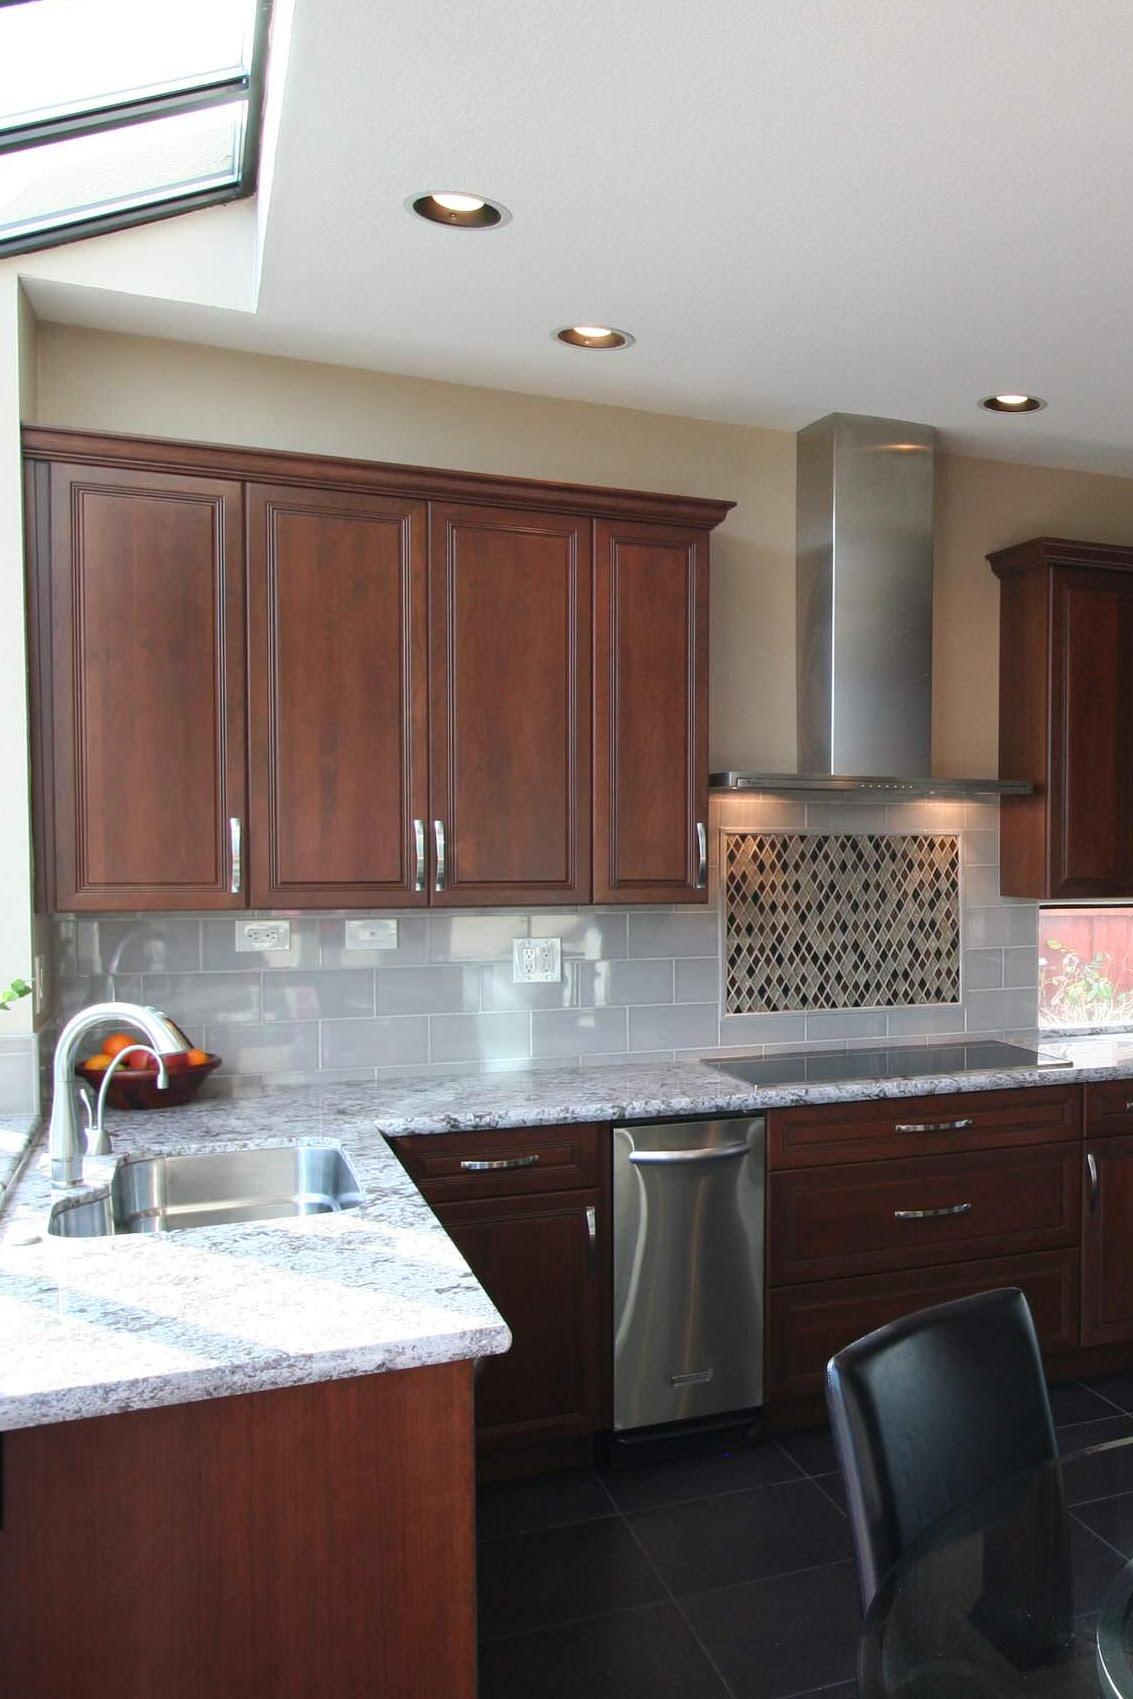 Dark Cabinets With White Granite Countertops Countertopsnews